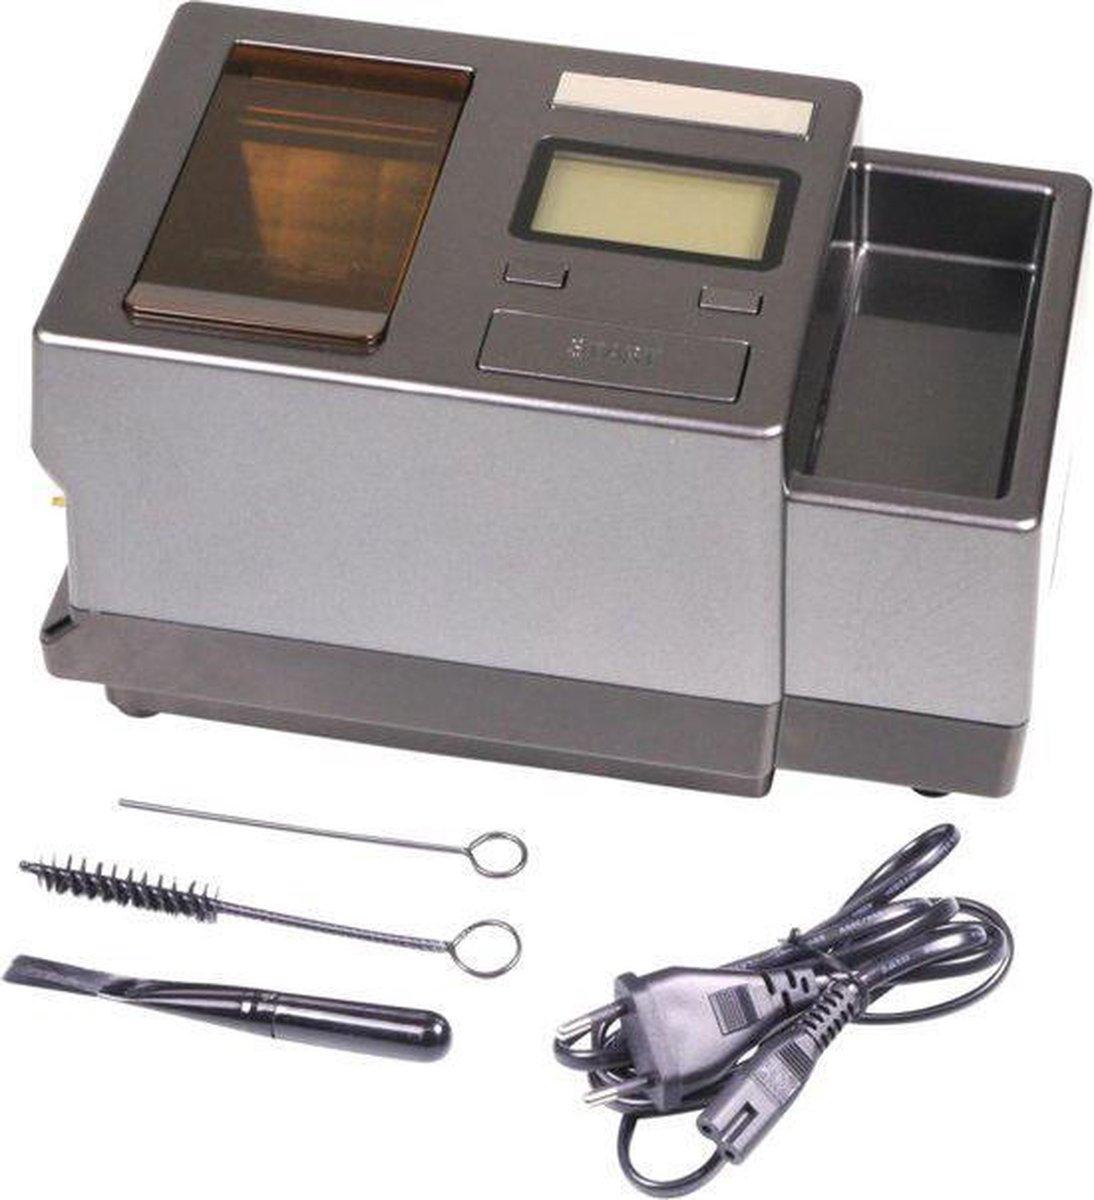 Powermatic 3 Plus sigarettenmachine